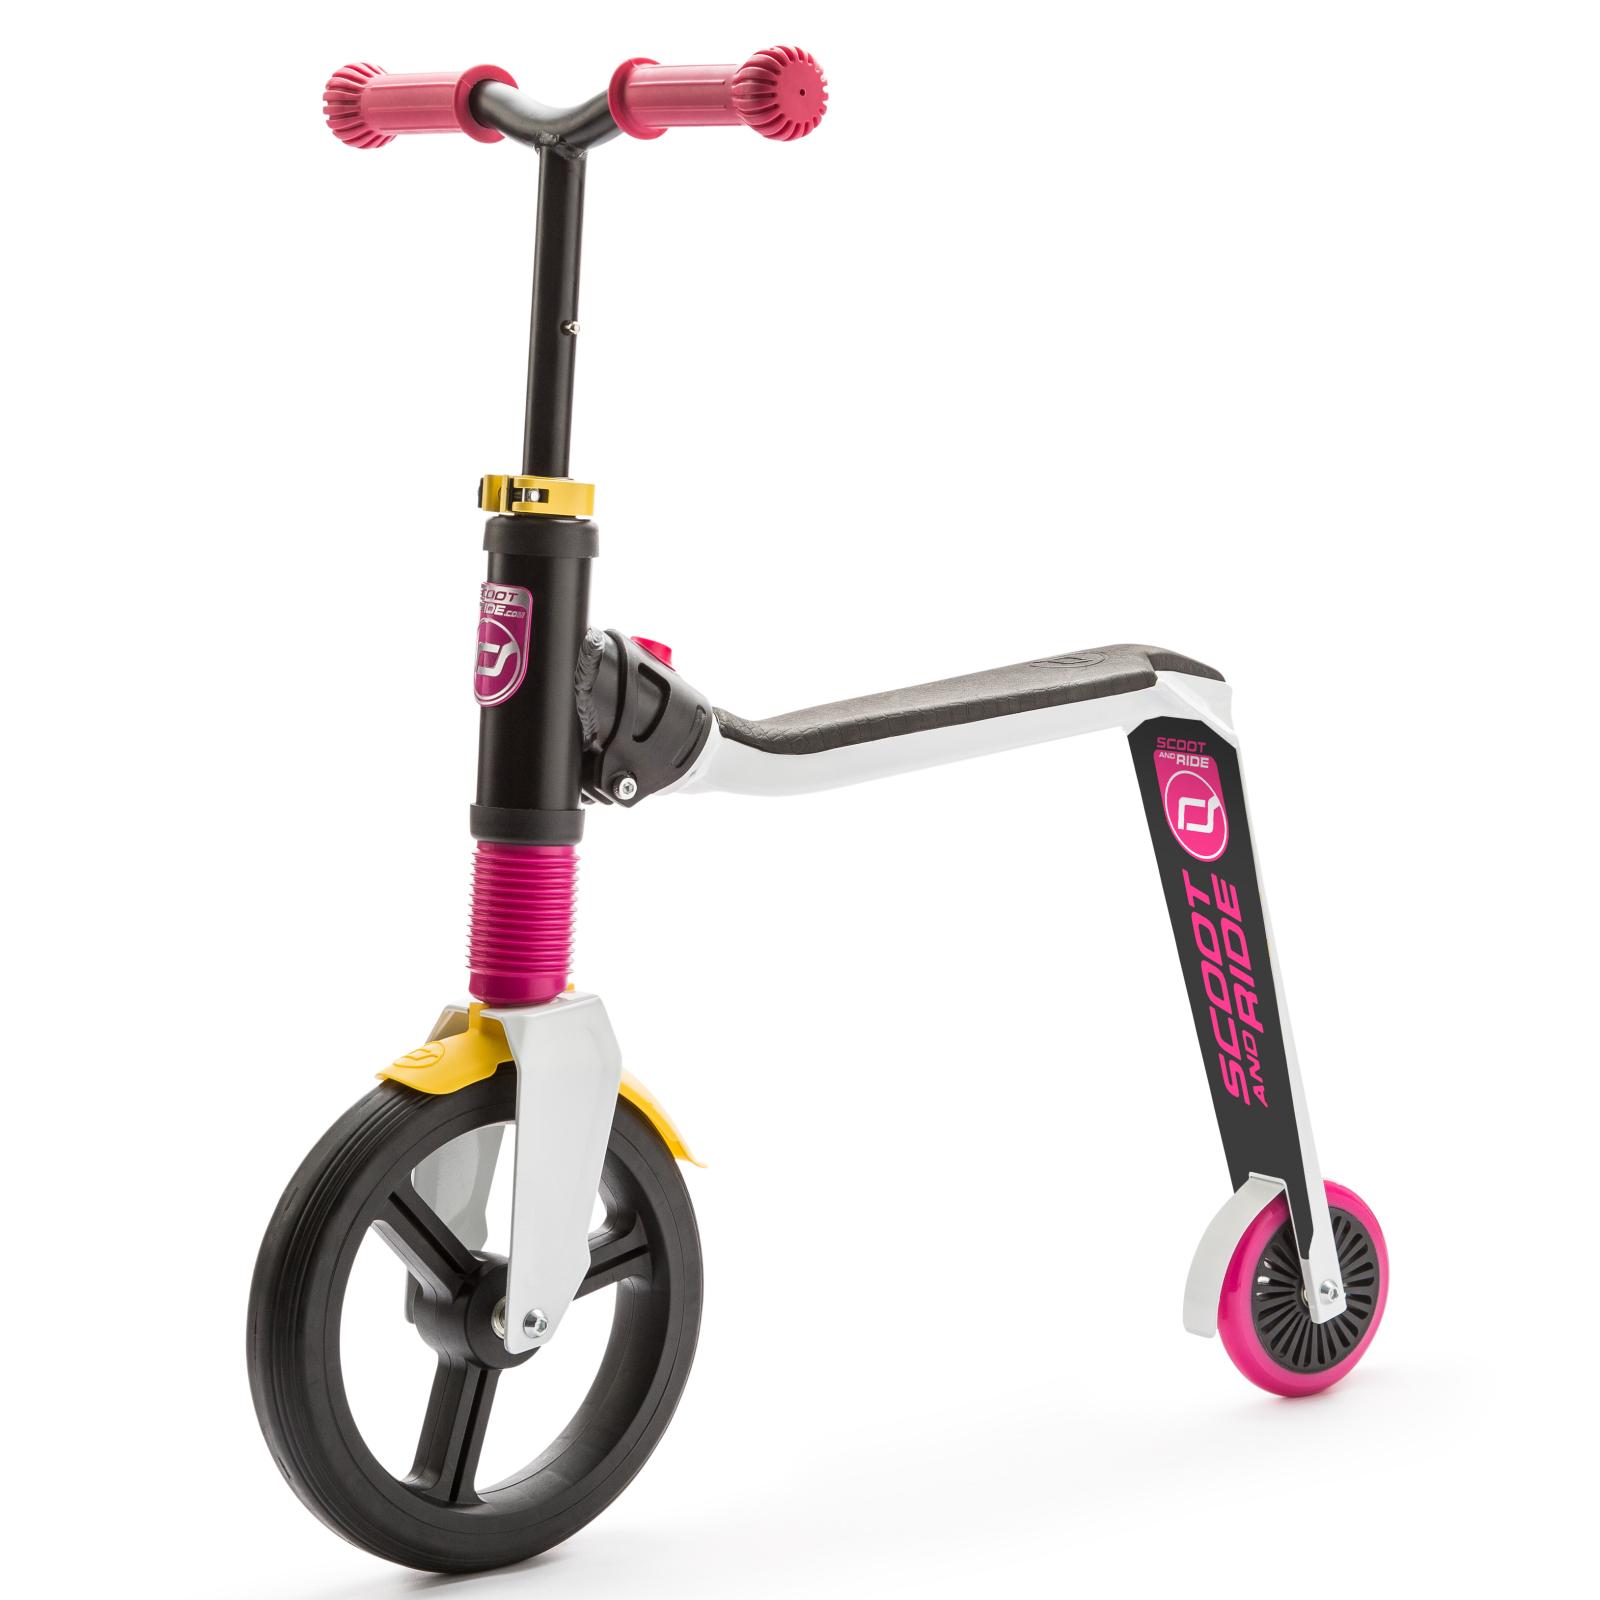 Самокат Scoot&Ride Highwayfreak 3.0 бело-розово-желтый (SR-202310-WHITE-PINK-YELLOW)